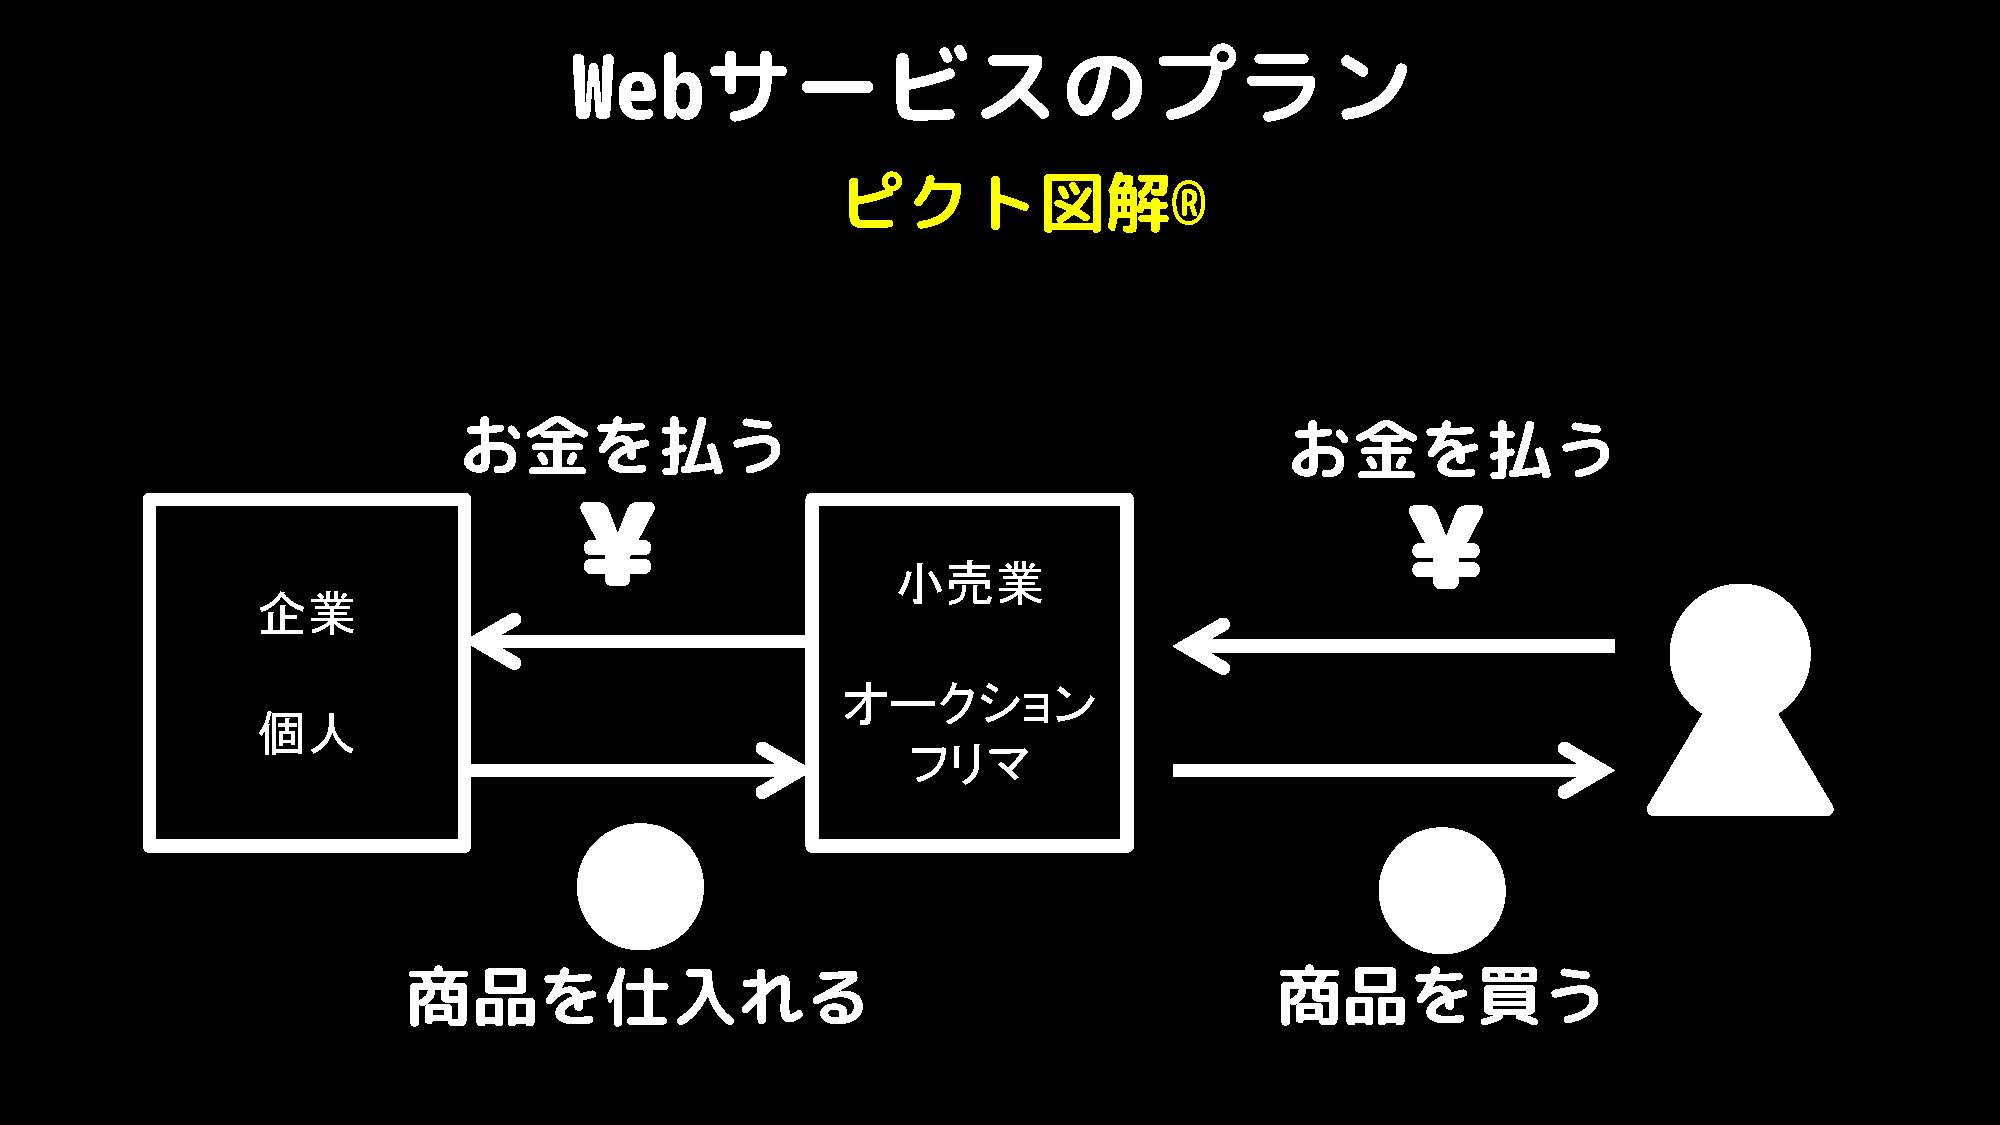 web-160911152159_%e3%83%9a%e3%83%bc%e3%82%b8_27